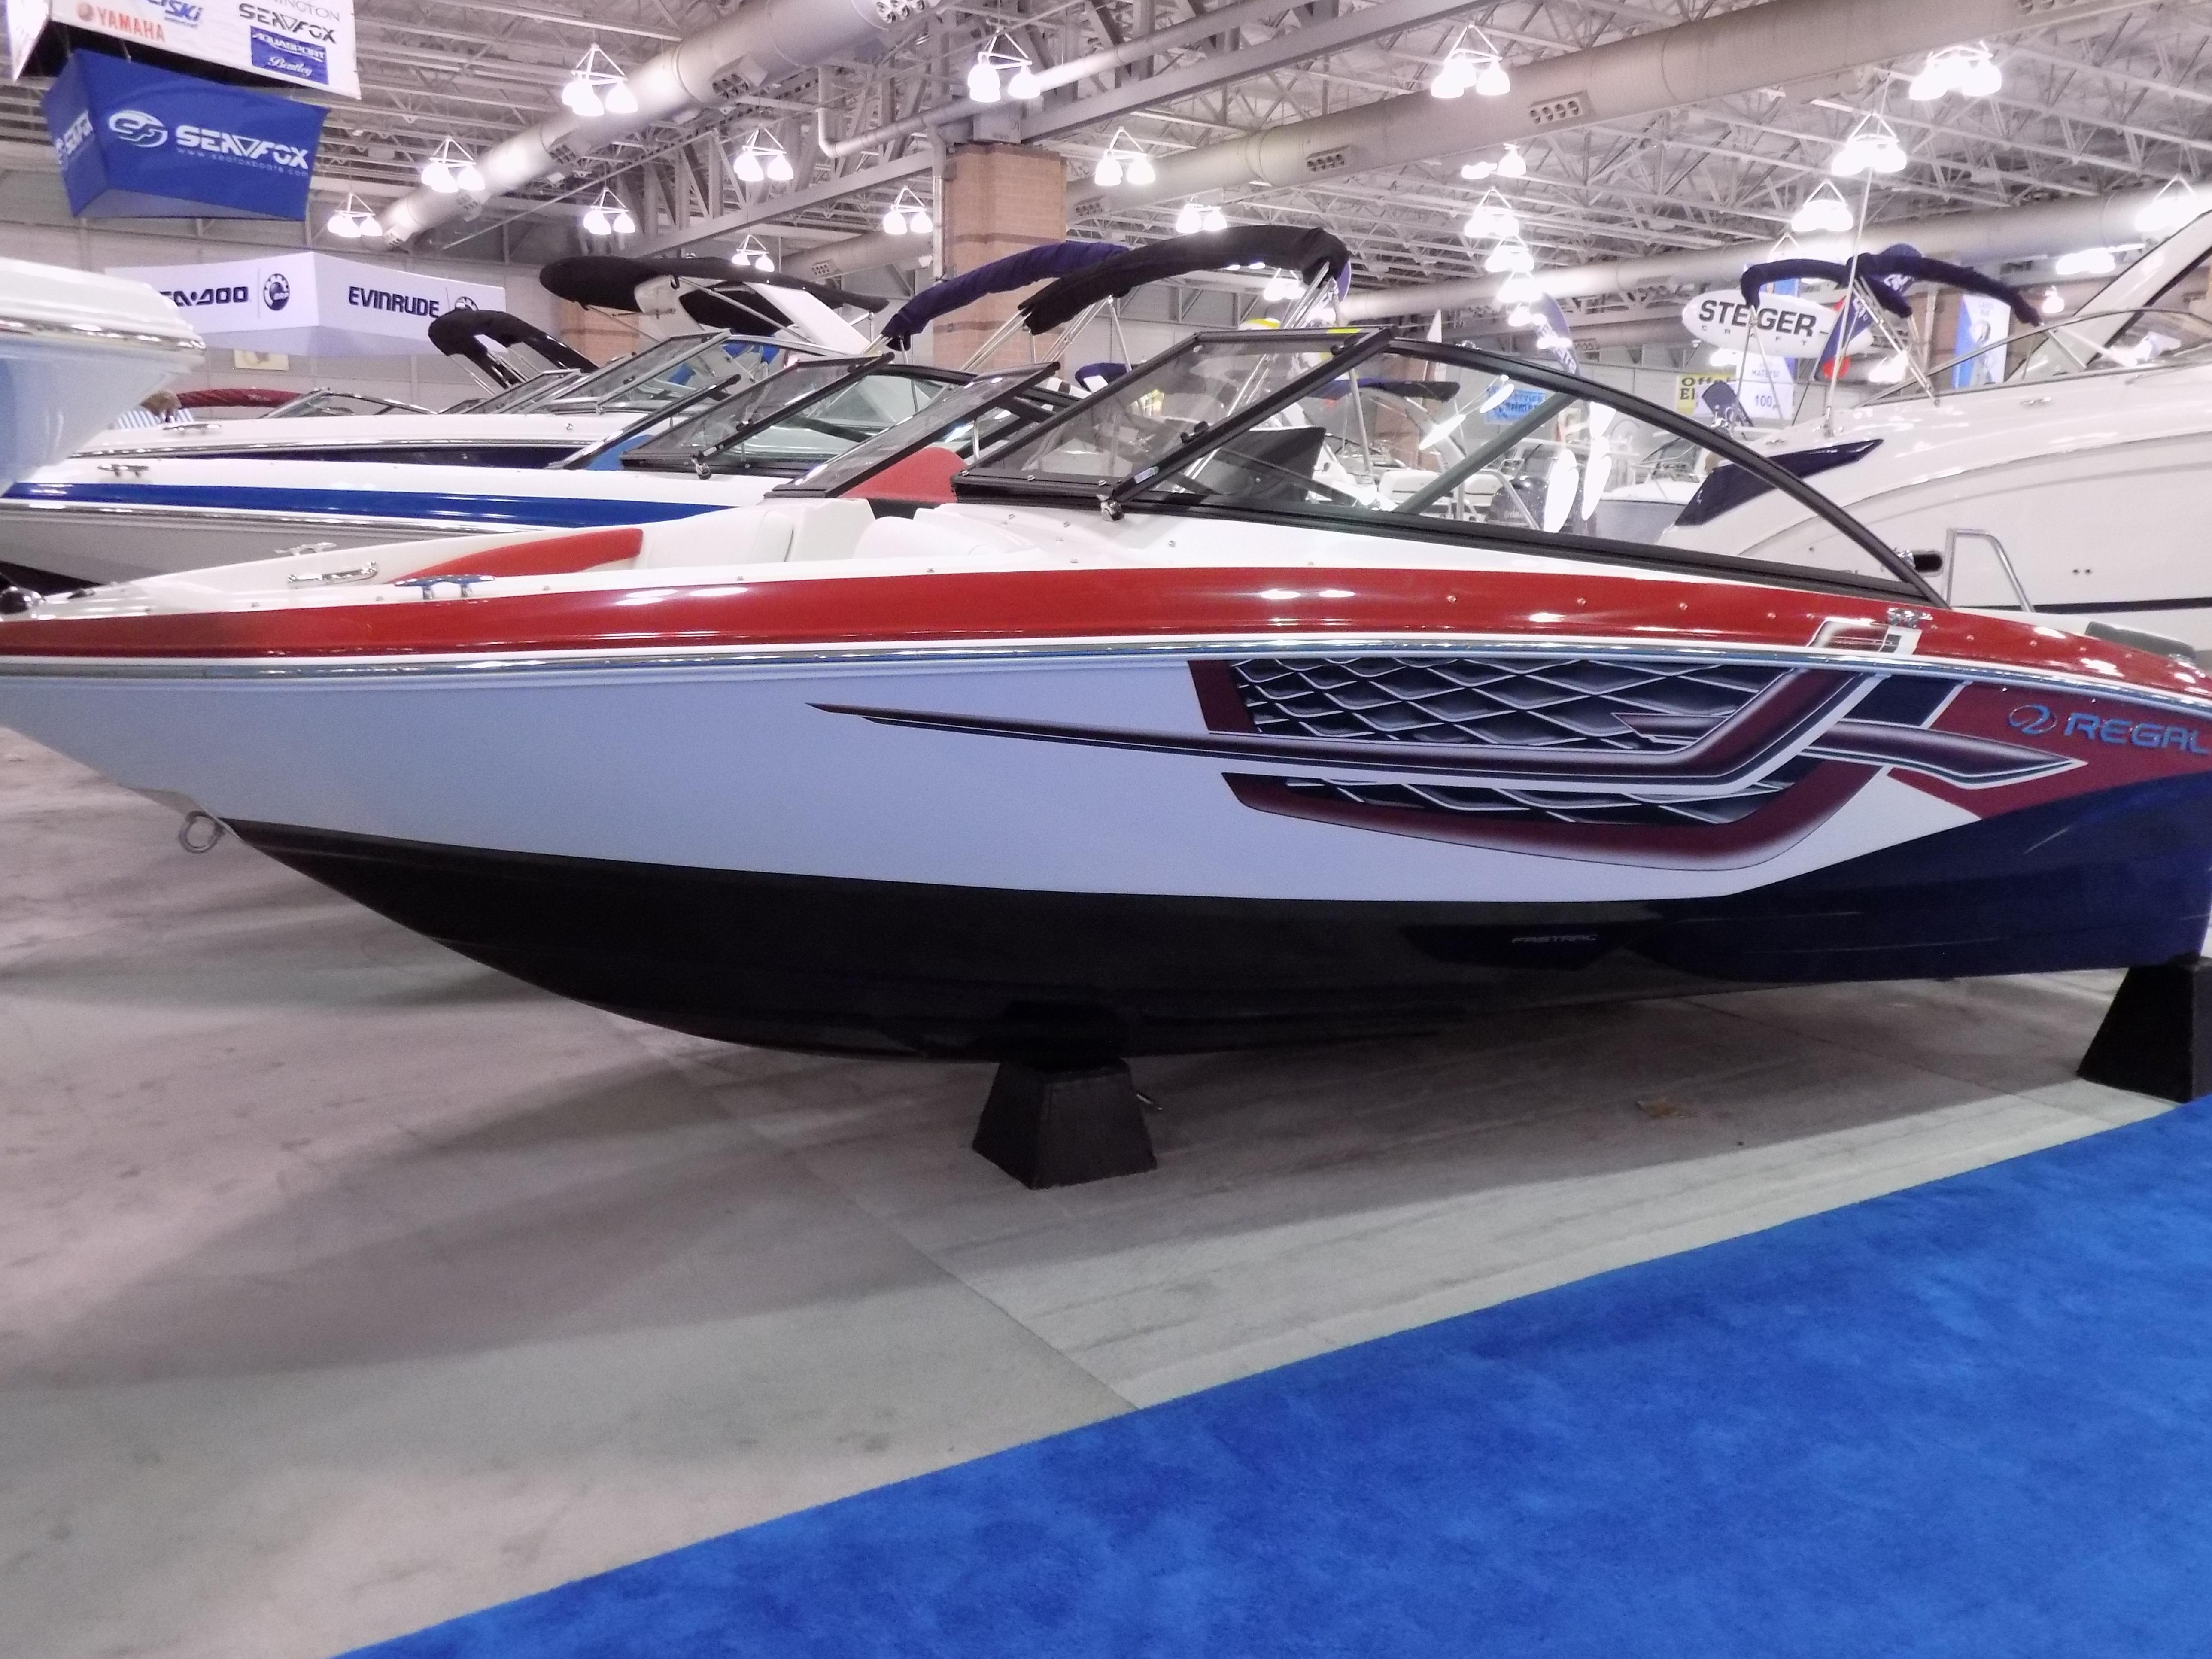 2017 Regal 1900 Esx Power Boat For Sale Www Yachtworld Com